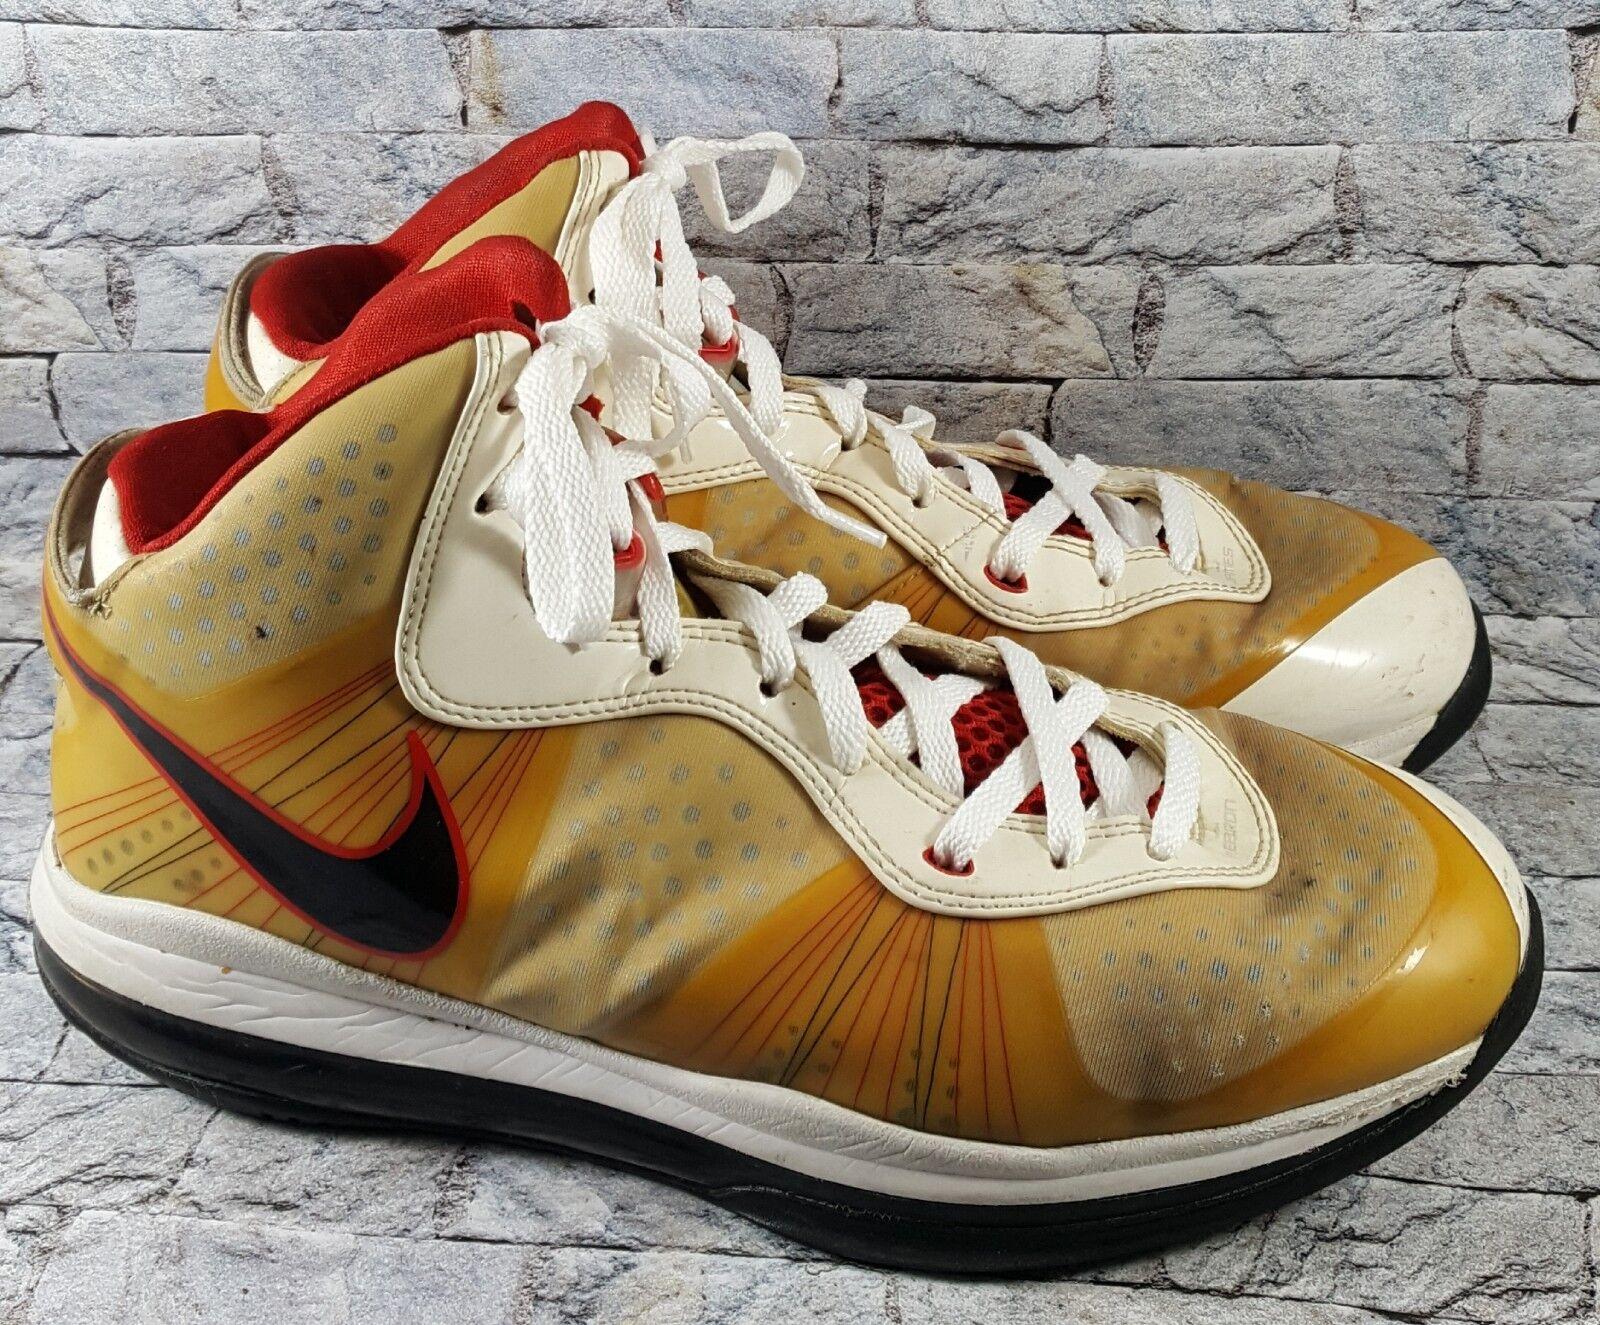 Nike Lebron VIII 8 V/2 Mens Mens V/2 White/Black/Red 429676-100 Basketball Shoes Sz 10.5 403157